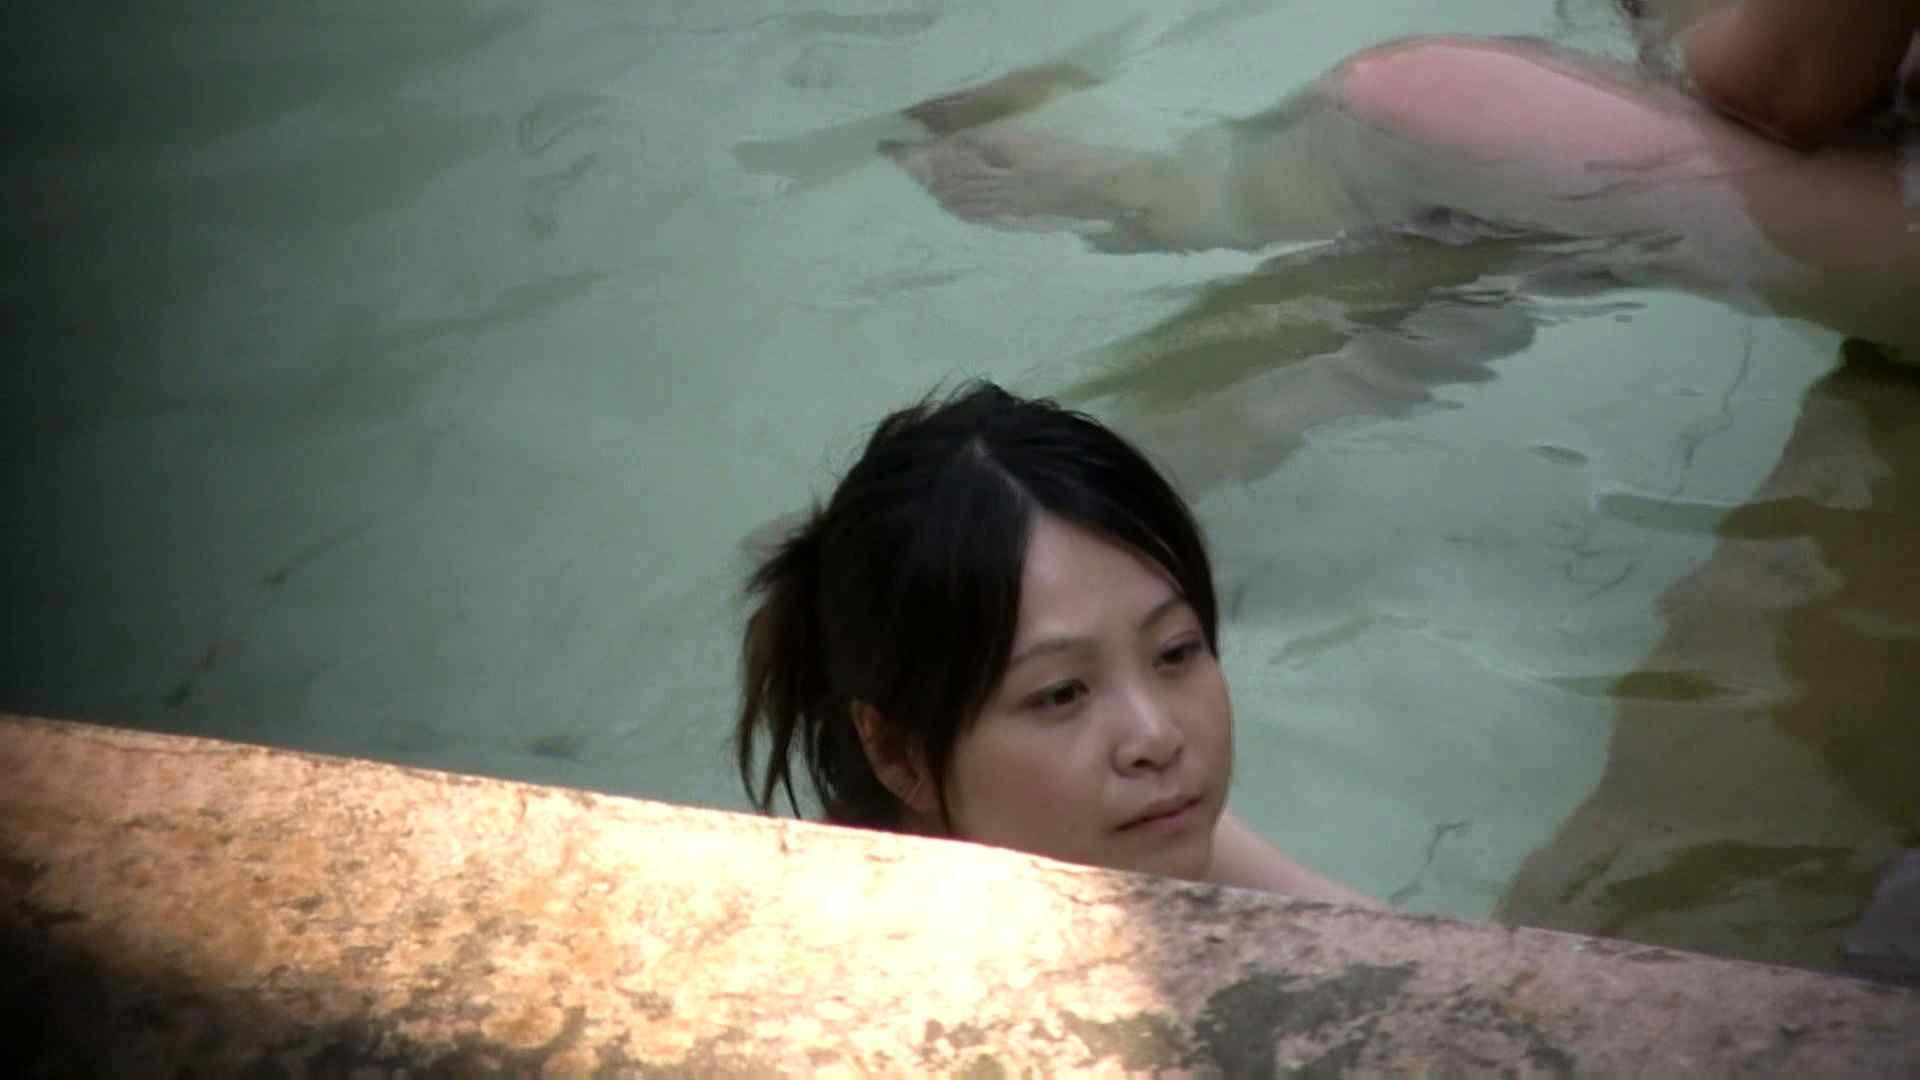 Aquaな露天風呂Vol.652 盗撮 | HなOL  105pic 10